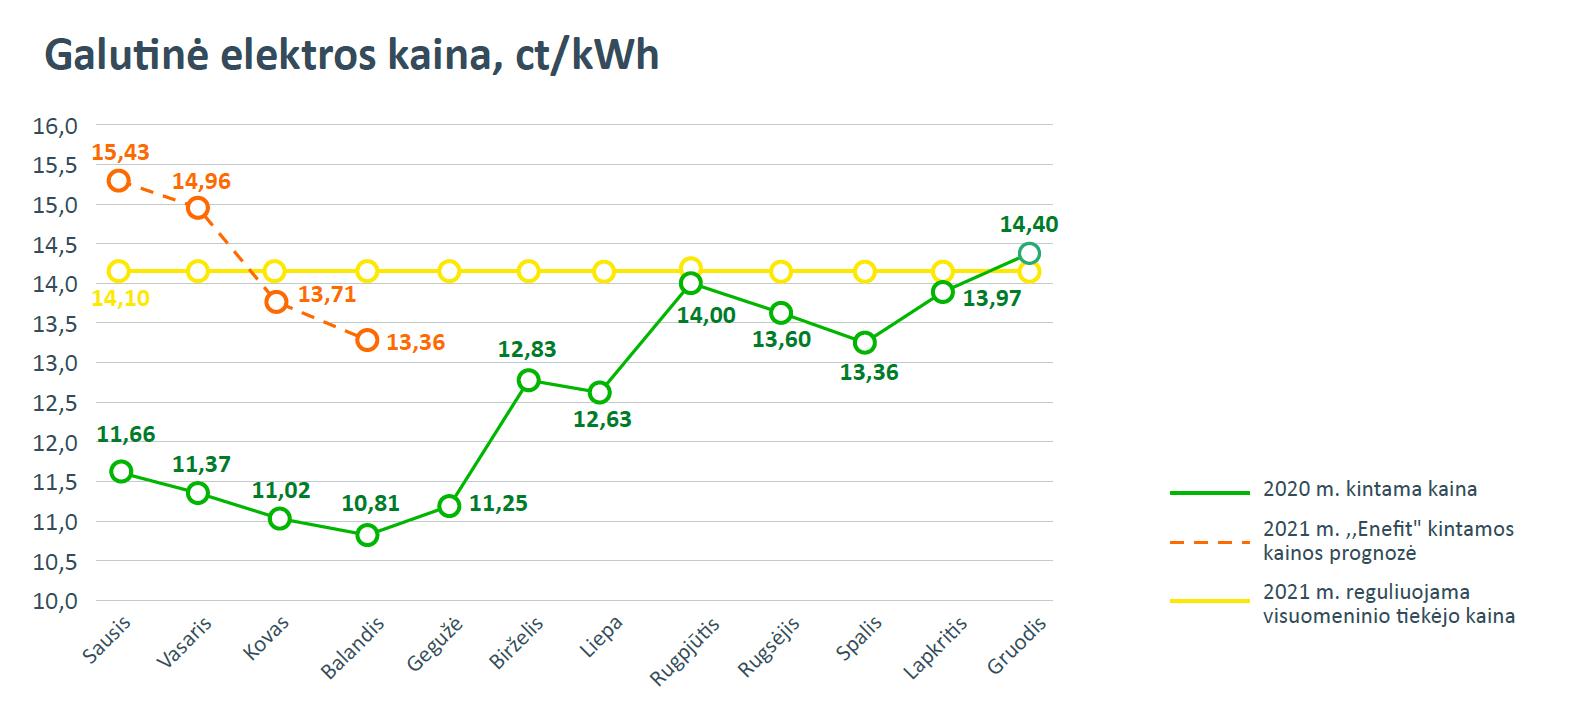 Galutinė elektros kaina, ct/kWh